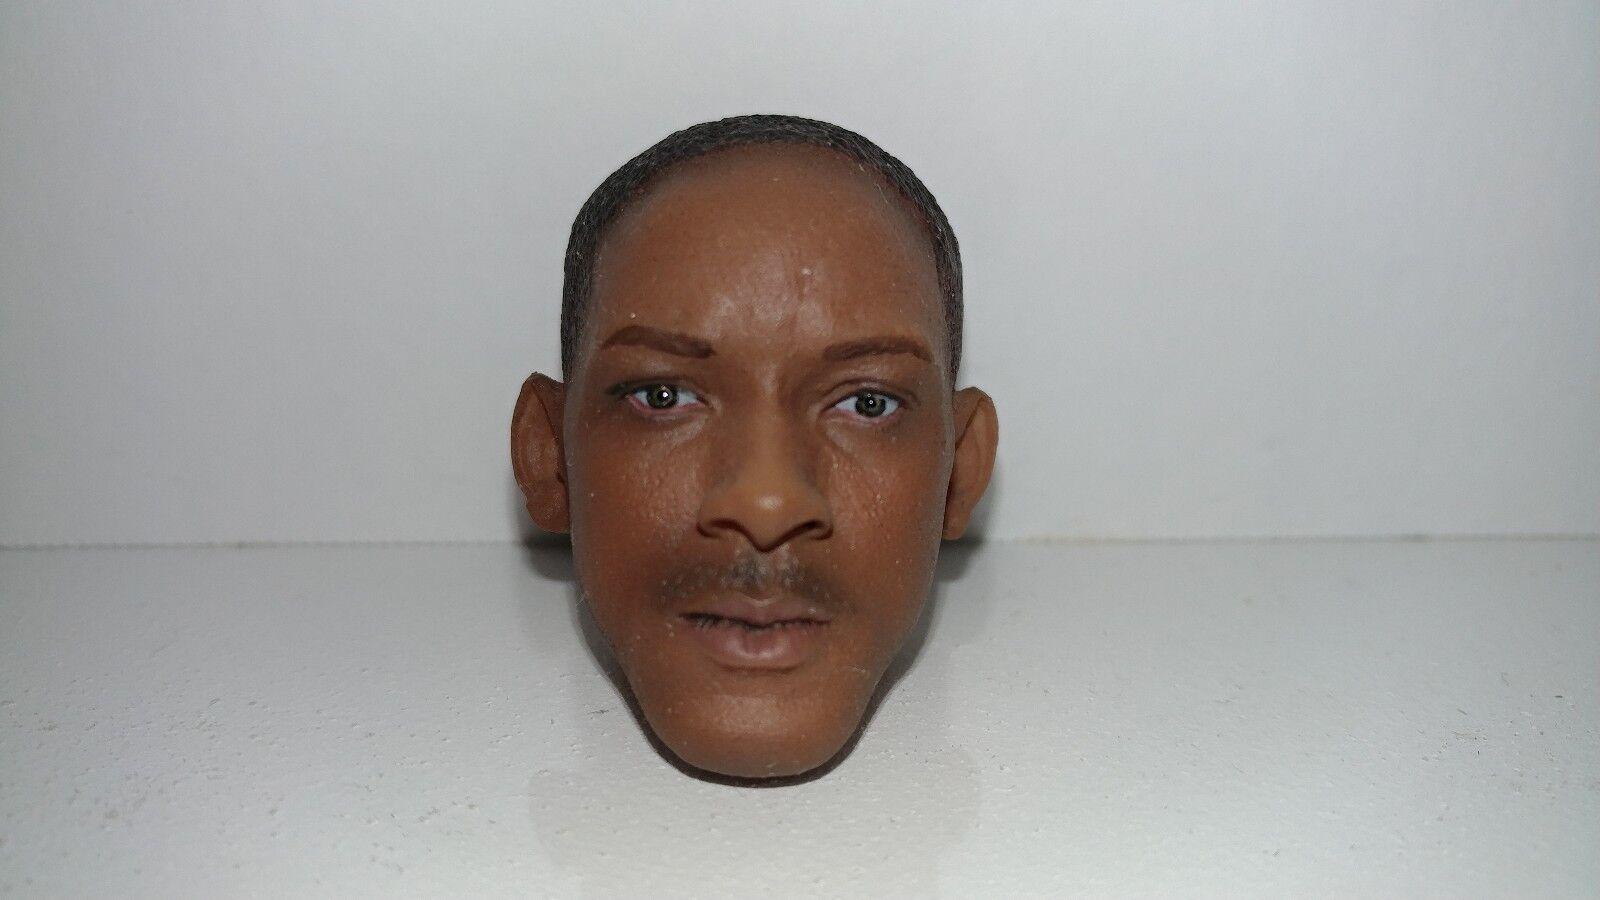 1 6 6 6 Belet Will Smith I Am Legend Neville head 534d26